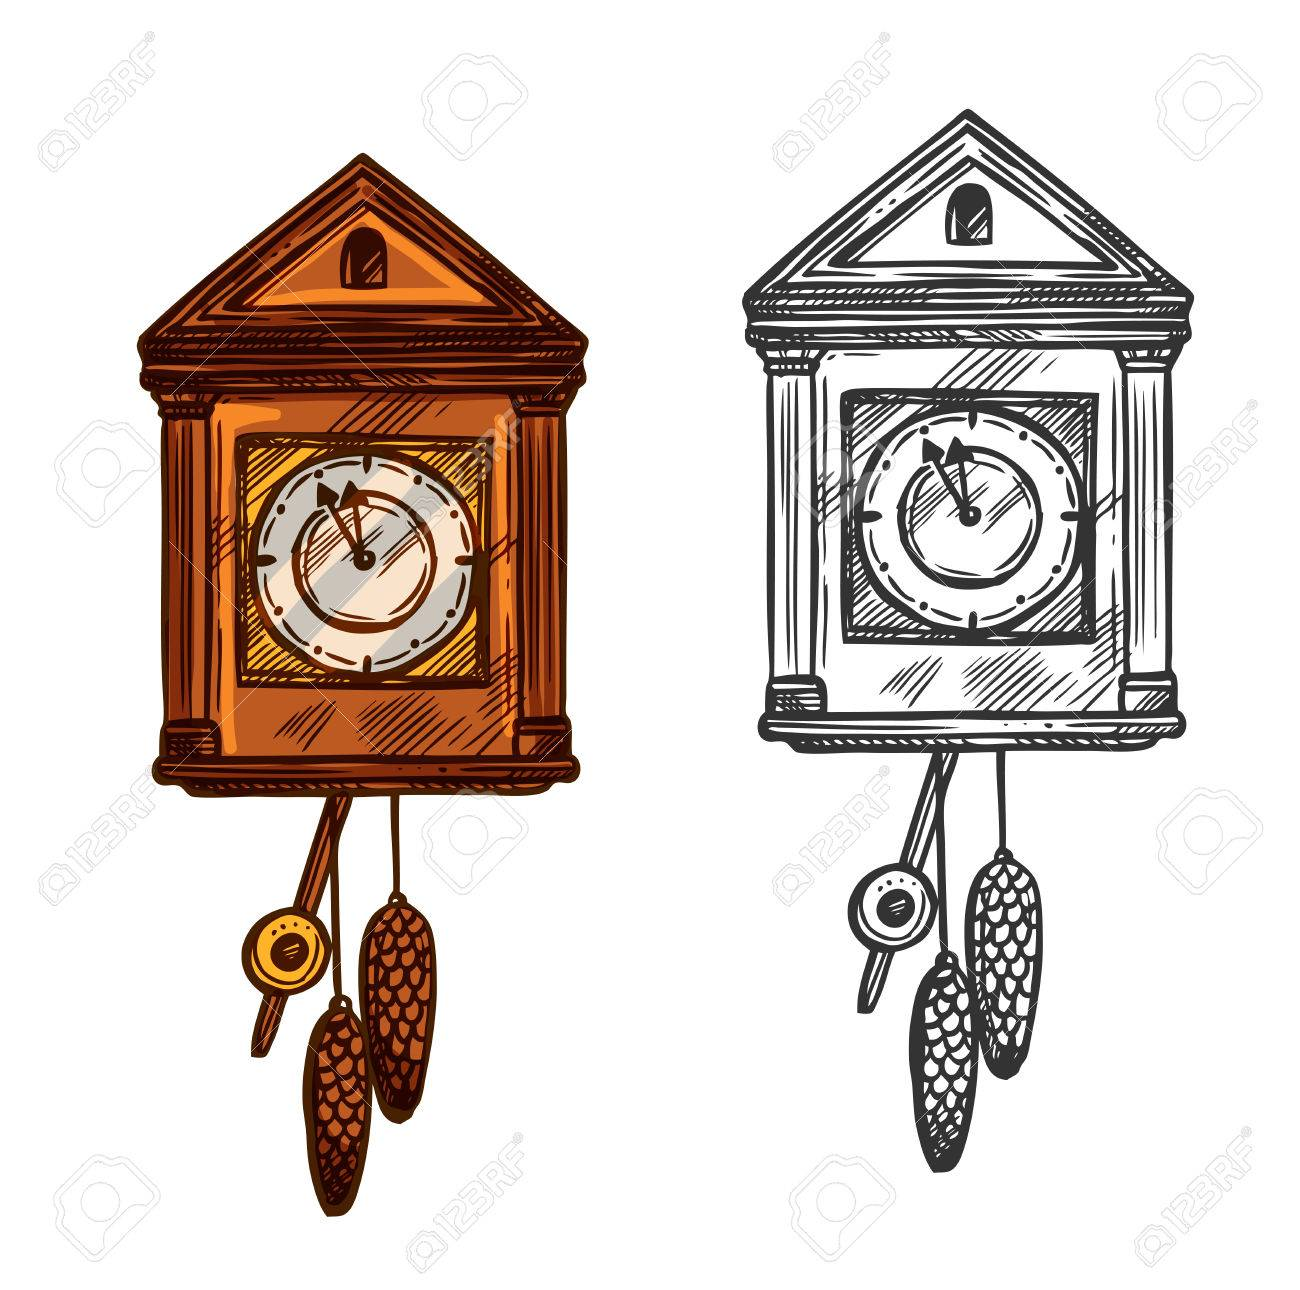 Reloj Del Ano Nuevo Vector Aislado Reloj De Pared De Cuco Dibujo